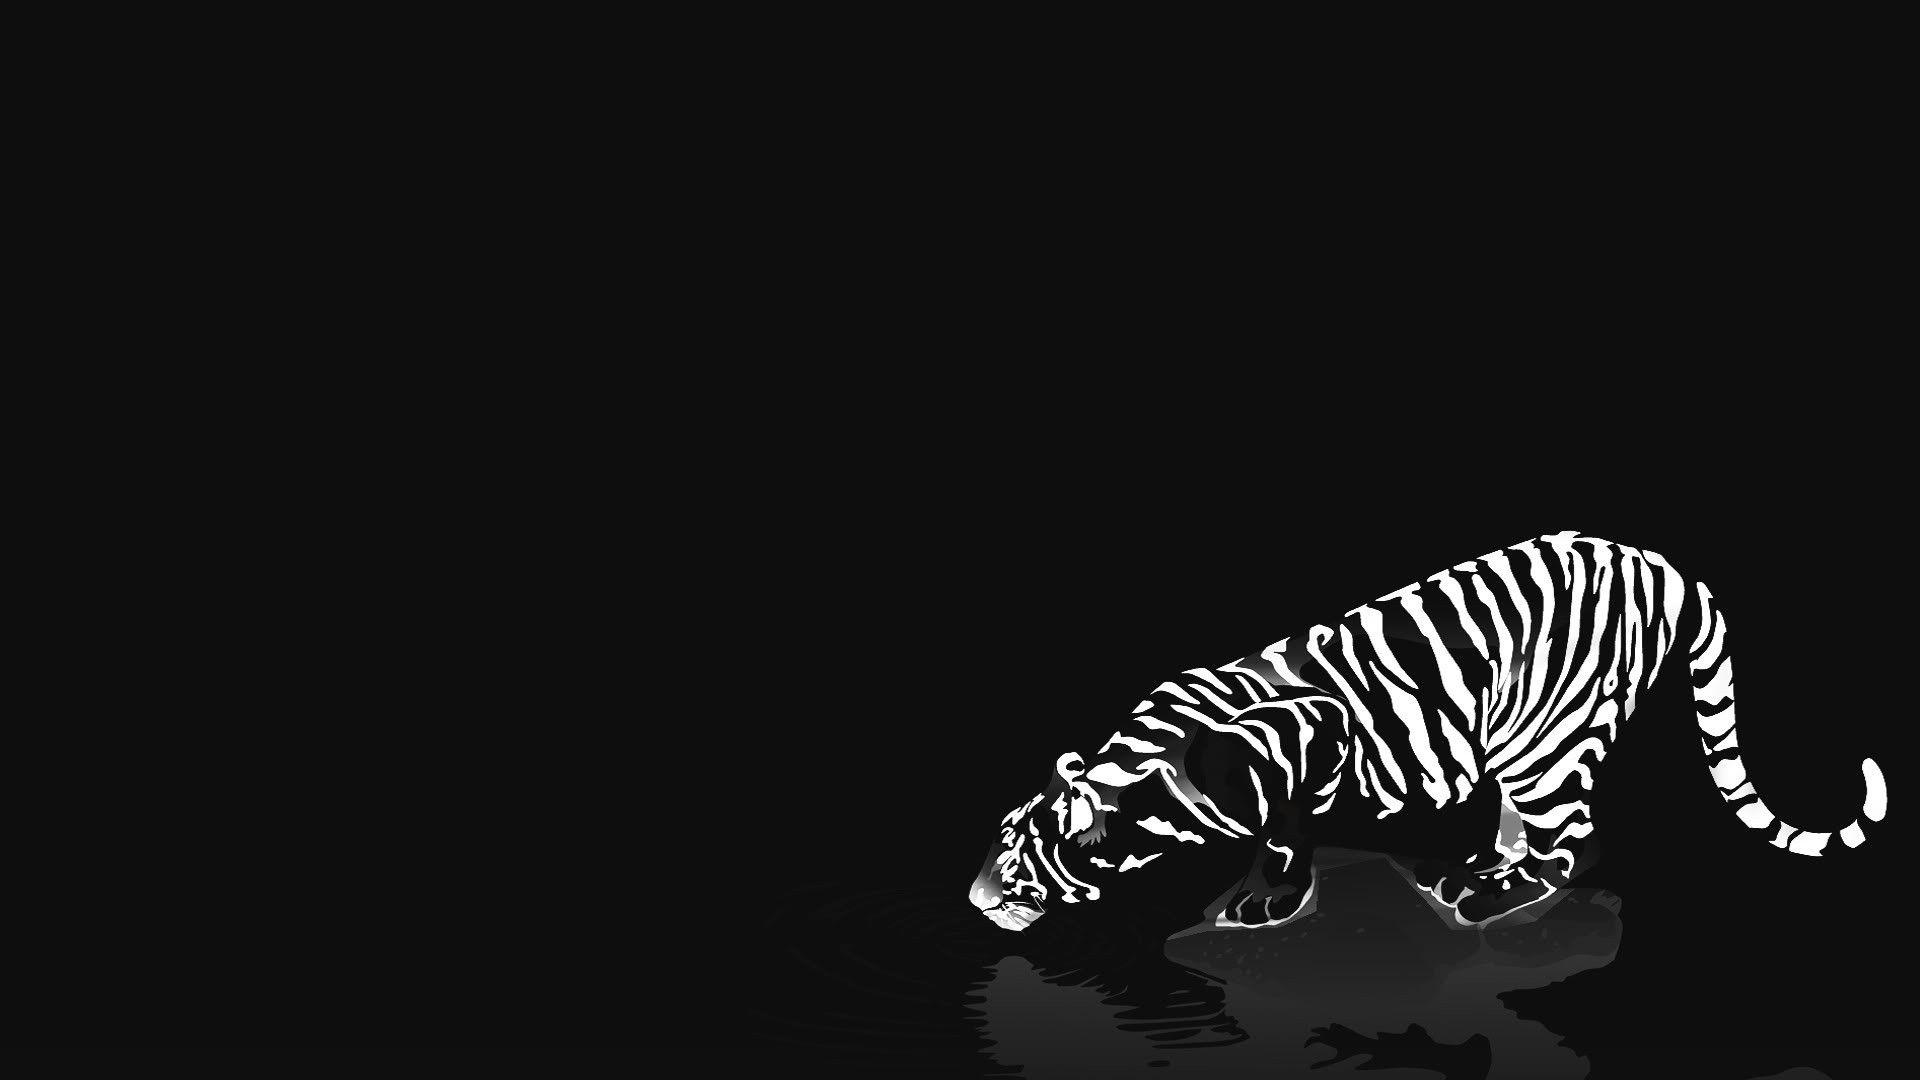 Tiger Art, Free Download Wallpaper